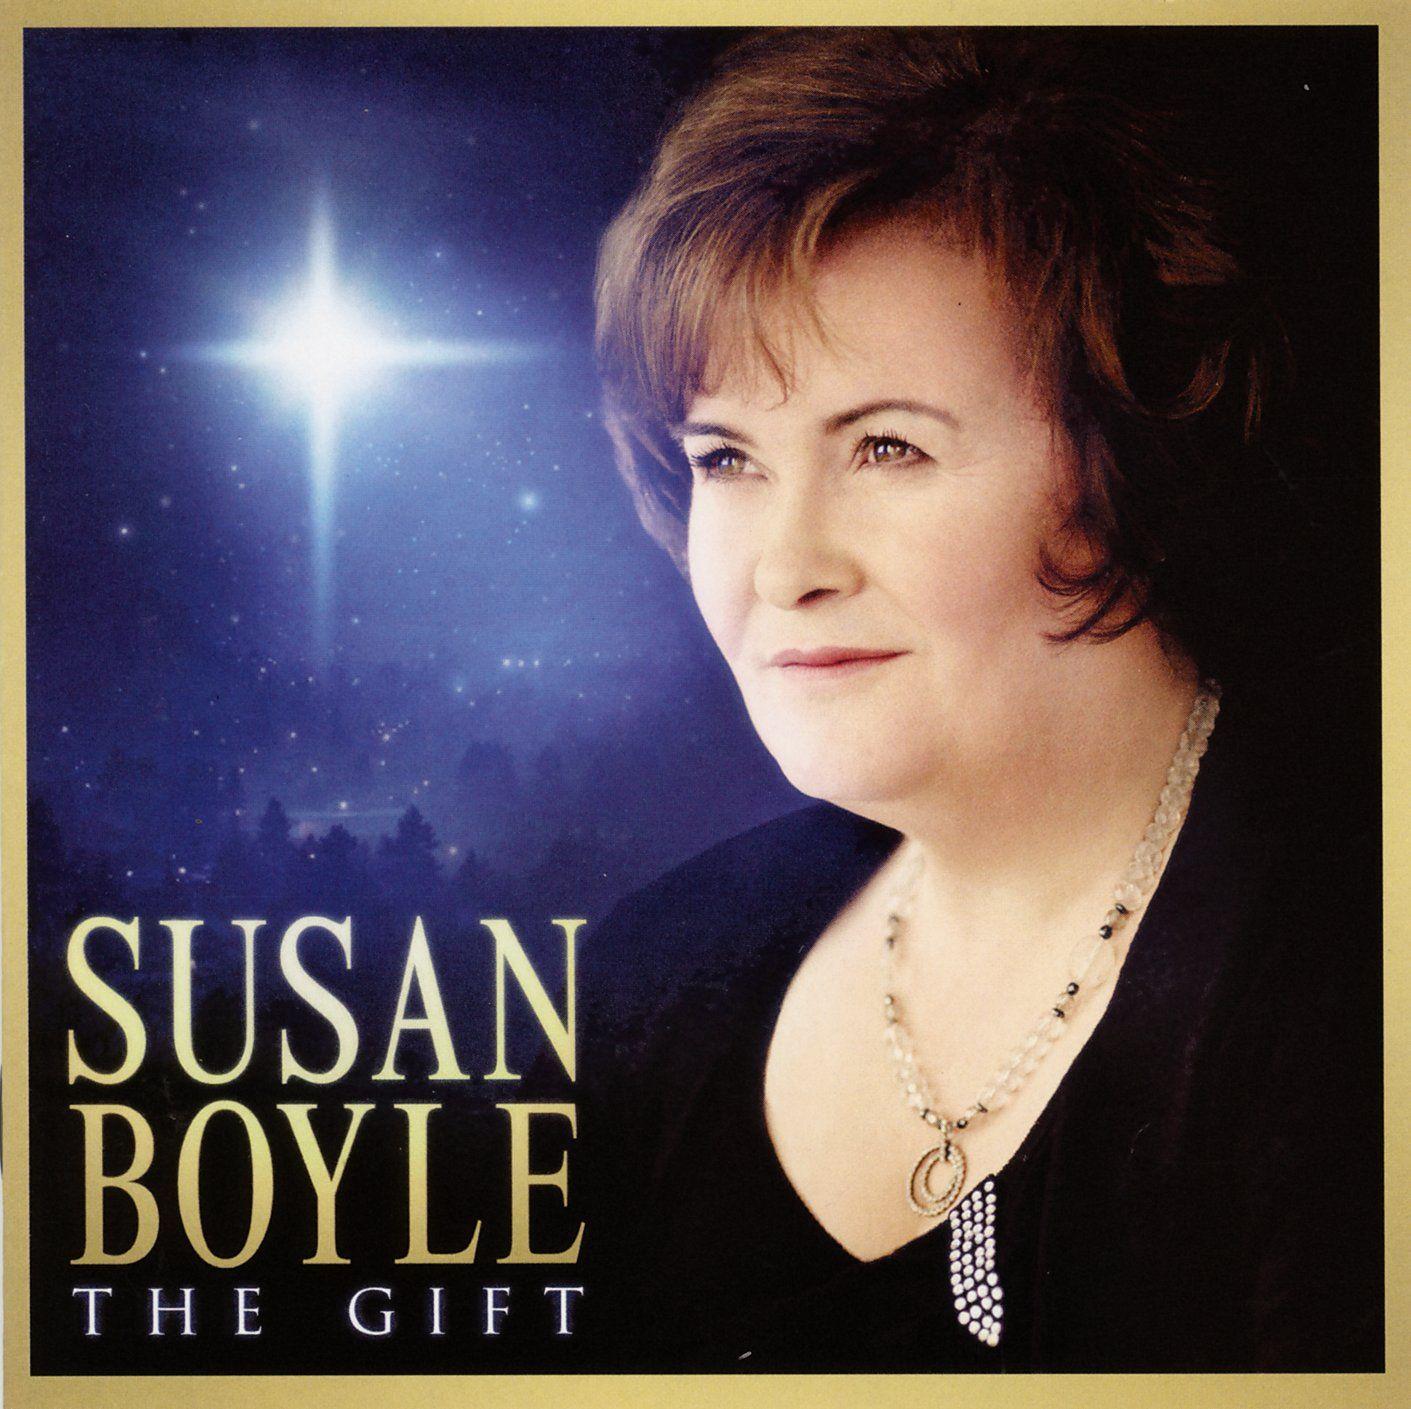 Susan Boyle - The Gift album cover